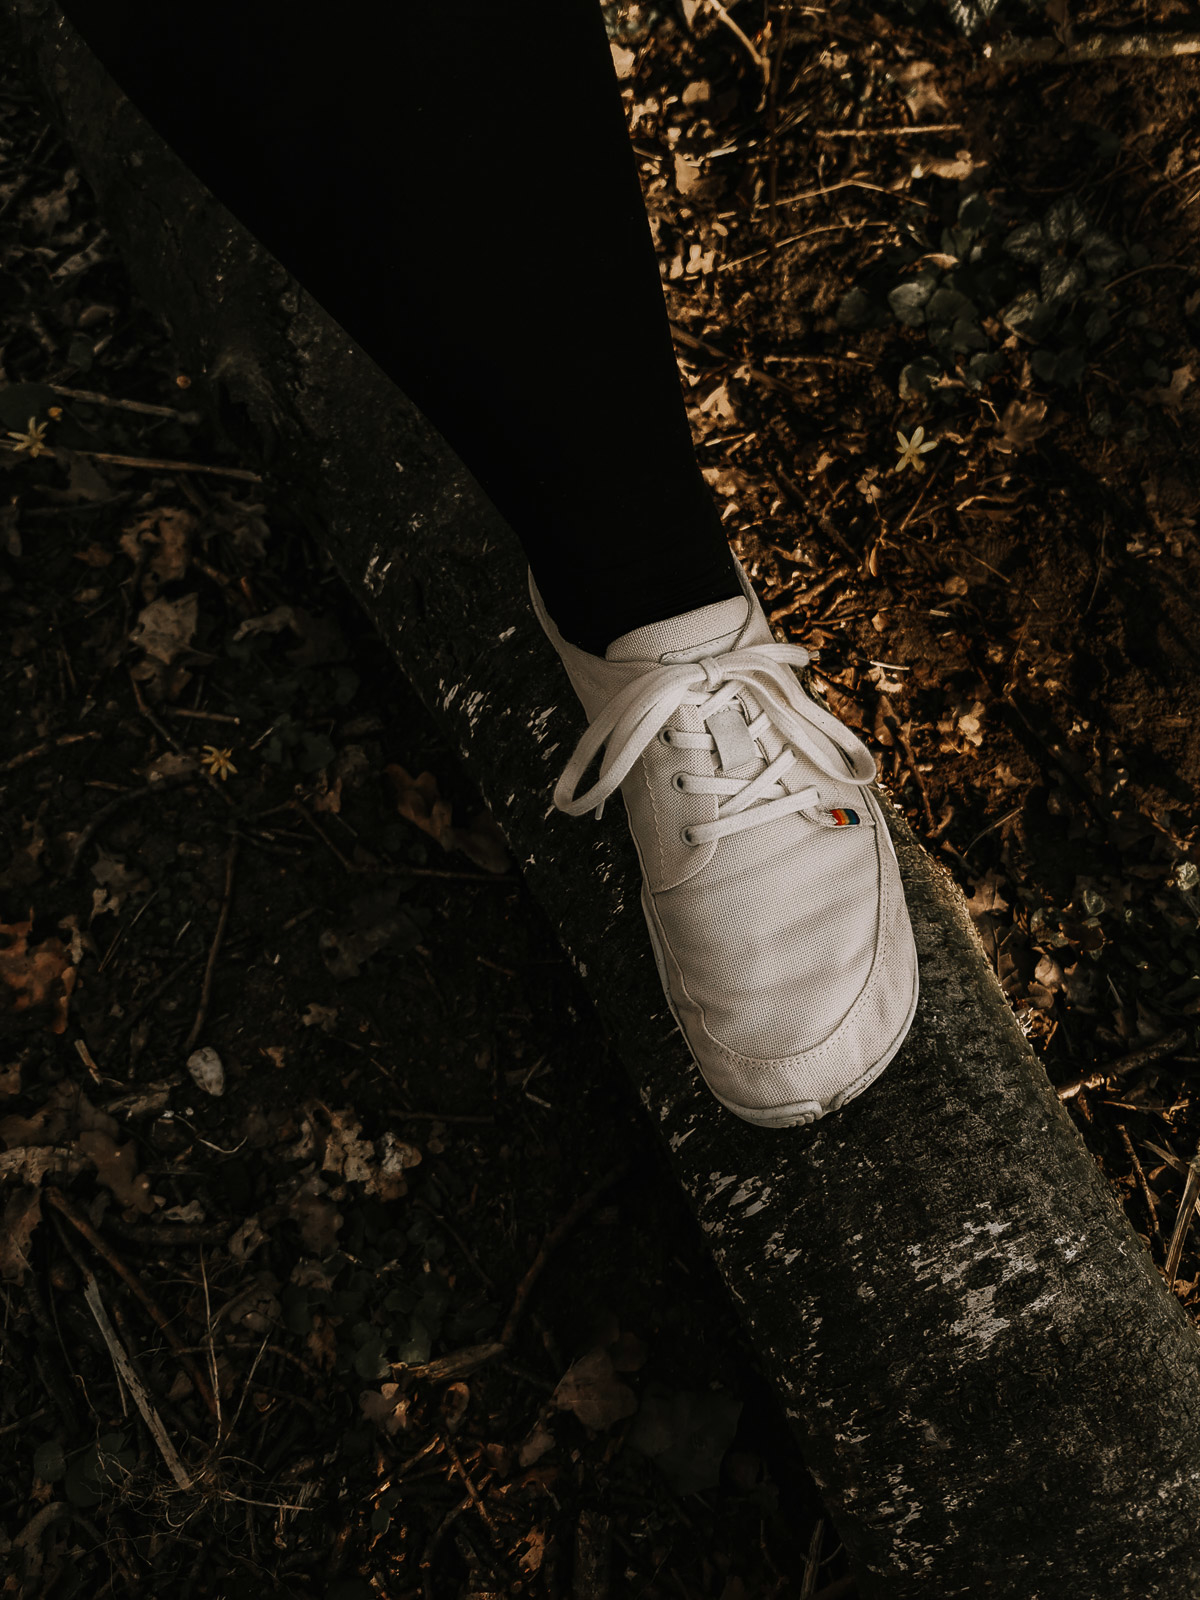 Wildling, Wildling Shoes, Wildlinge im Test, Wildling Schuhe Erfahrungsbericht, Wildling Erfahrungsbericht, Minimalschuhe, Minimalschuhe Erfahrungsbericht, Minimalschuhe Test, Minimalschuhe, Minimalschuhen